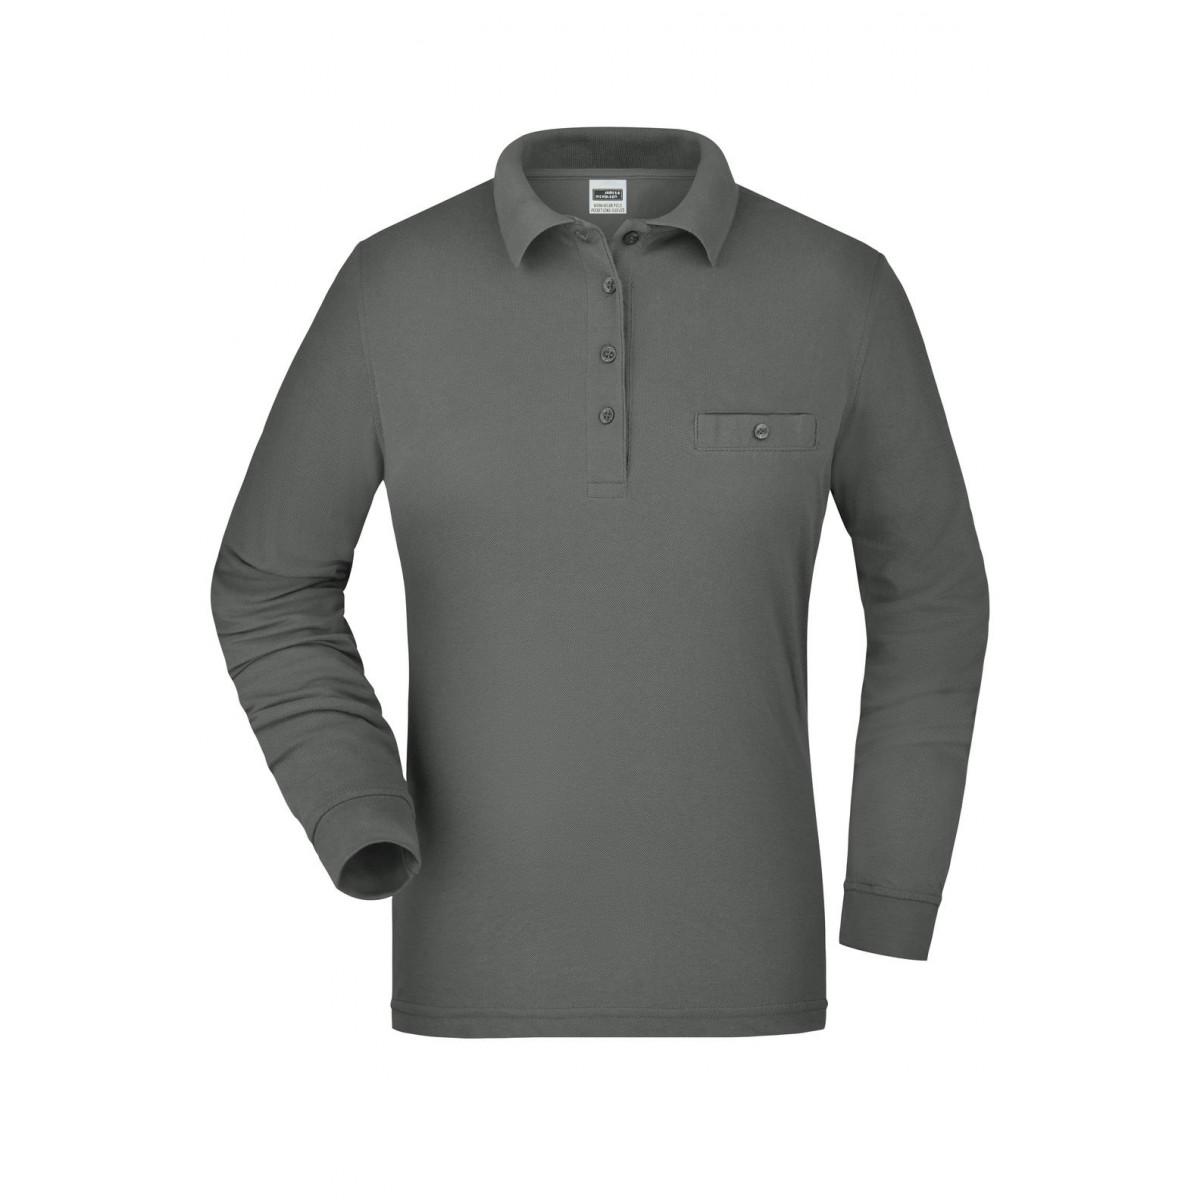 Рубашка поло женская JN865 Ladies Workwear Polo Pocket Longsleeve - Темно-серый